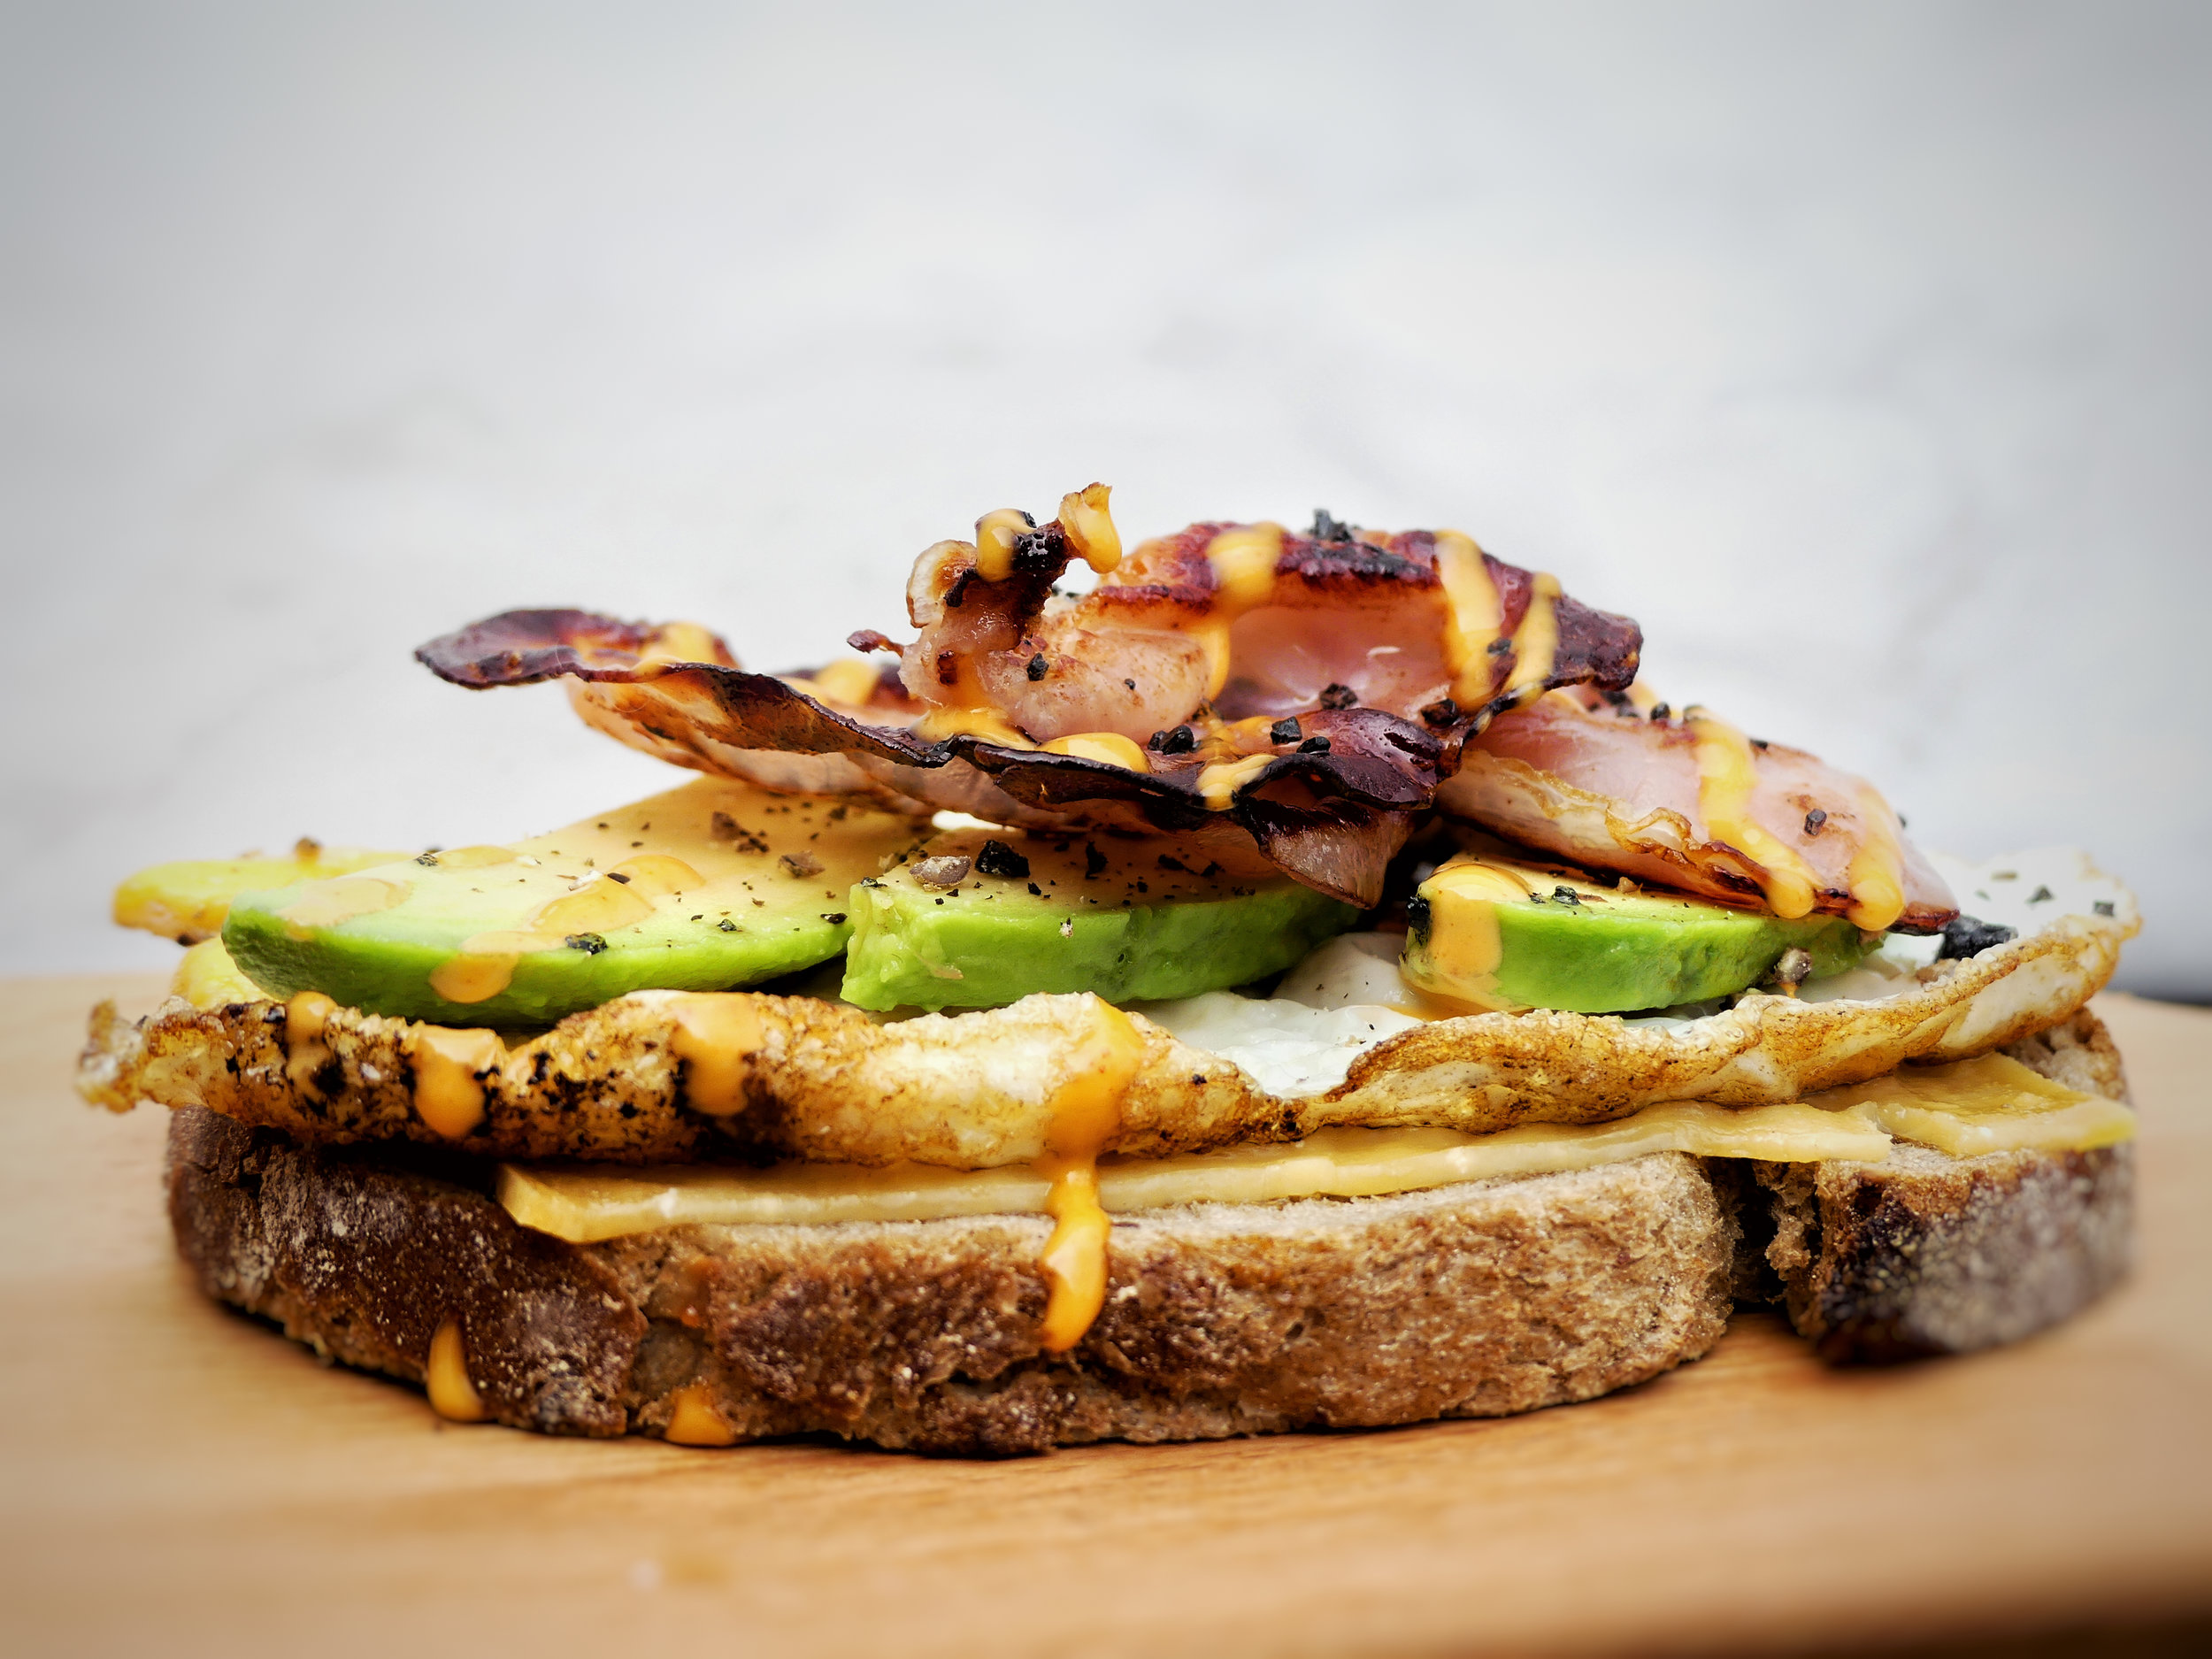 Spiksplinternieuw Oerbrood, melted old cheese, fried egg, avocado & bacon CI-28